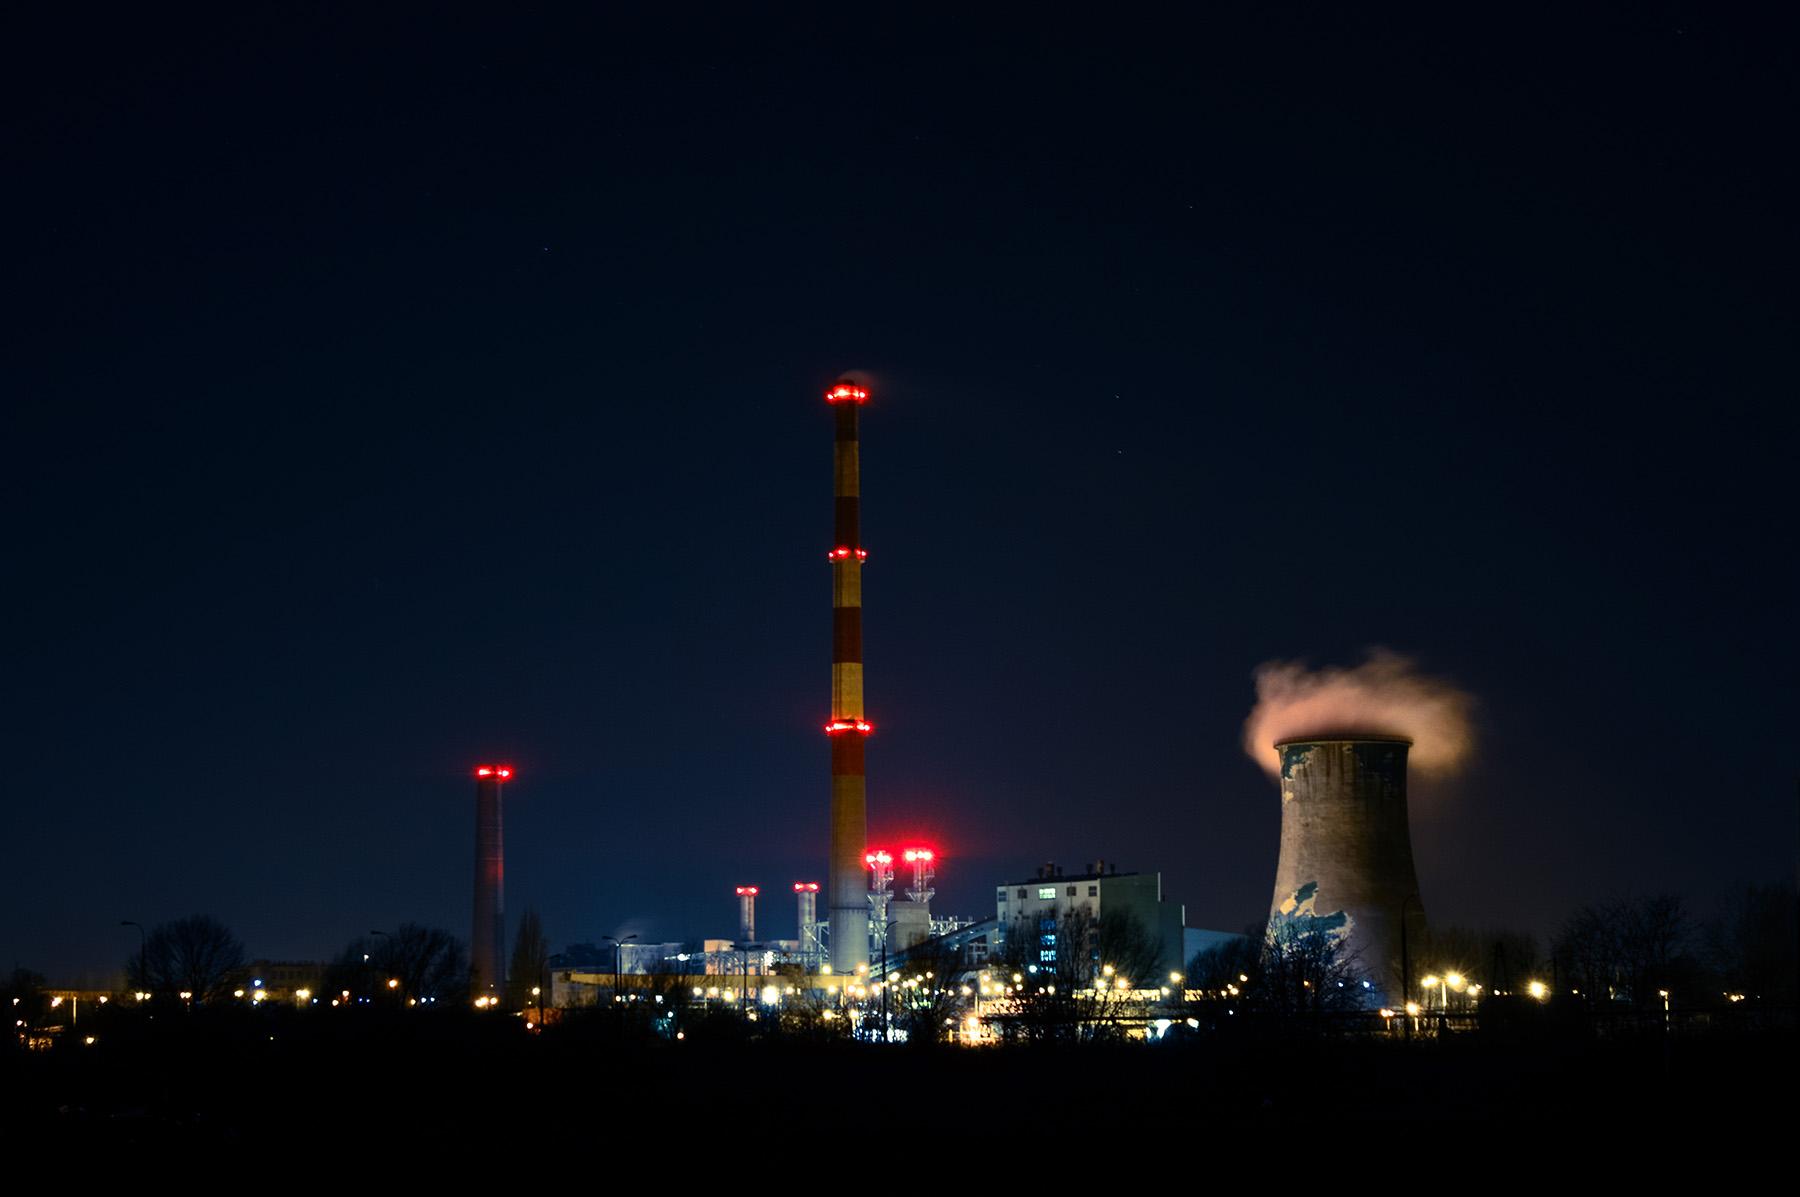 kraftwerke_sfa_systems